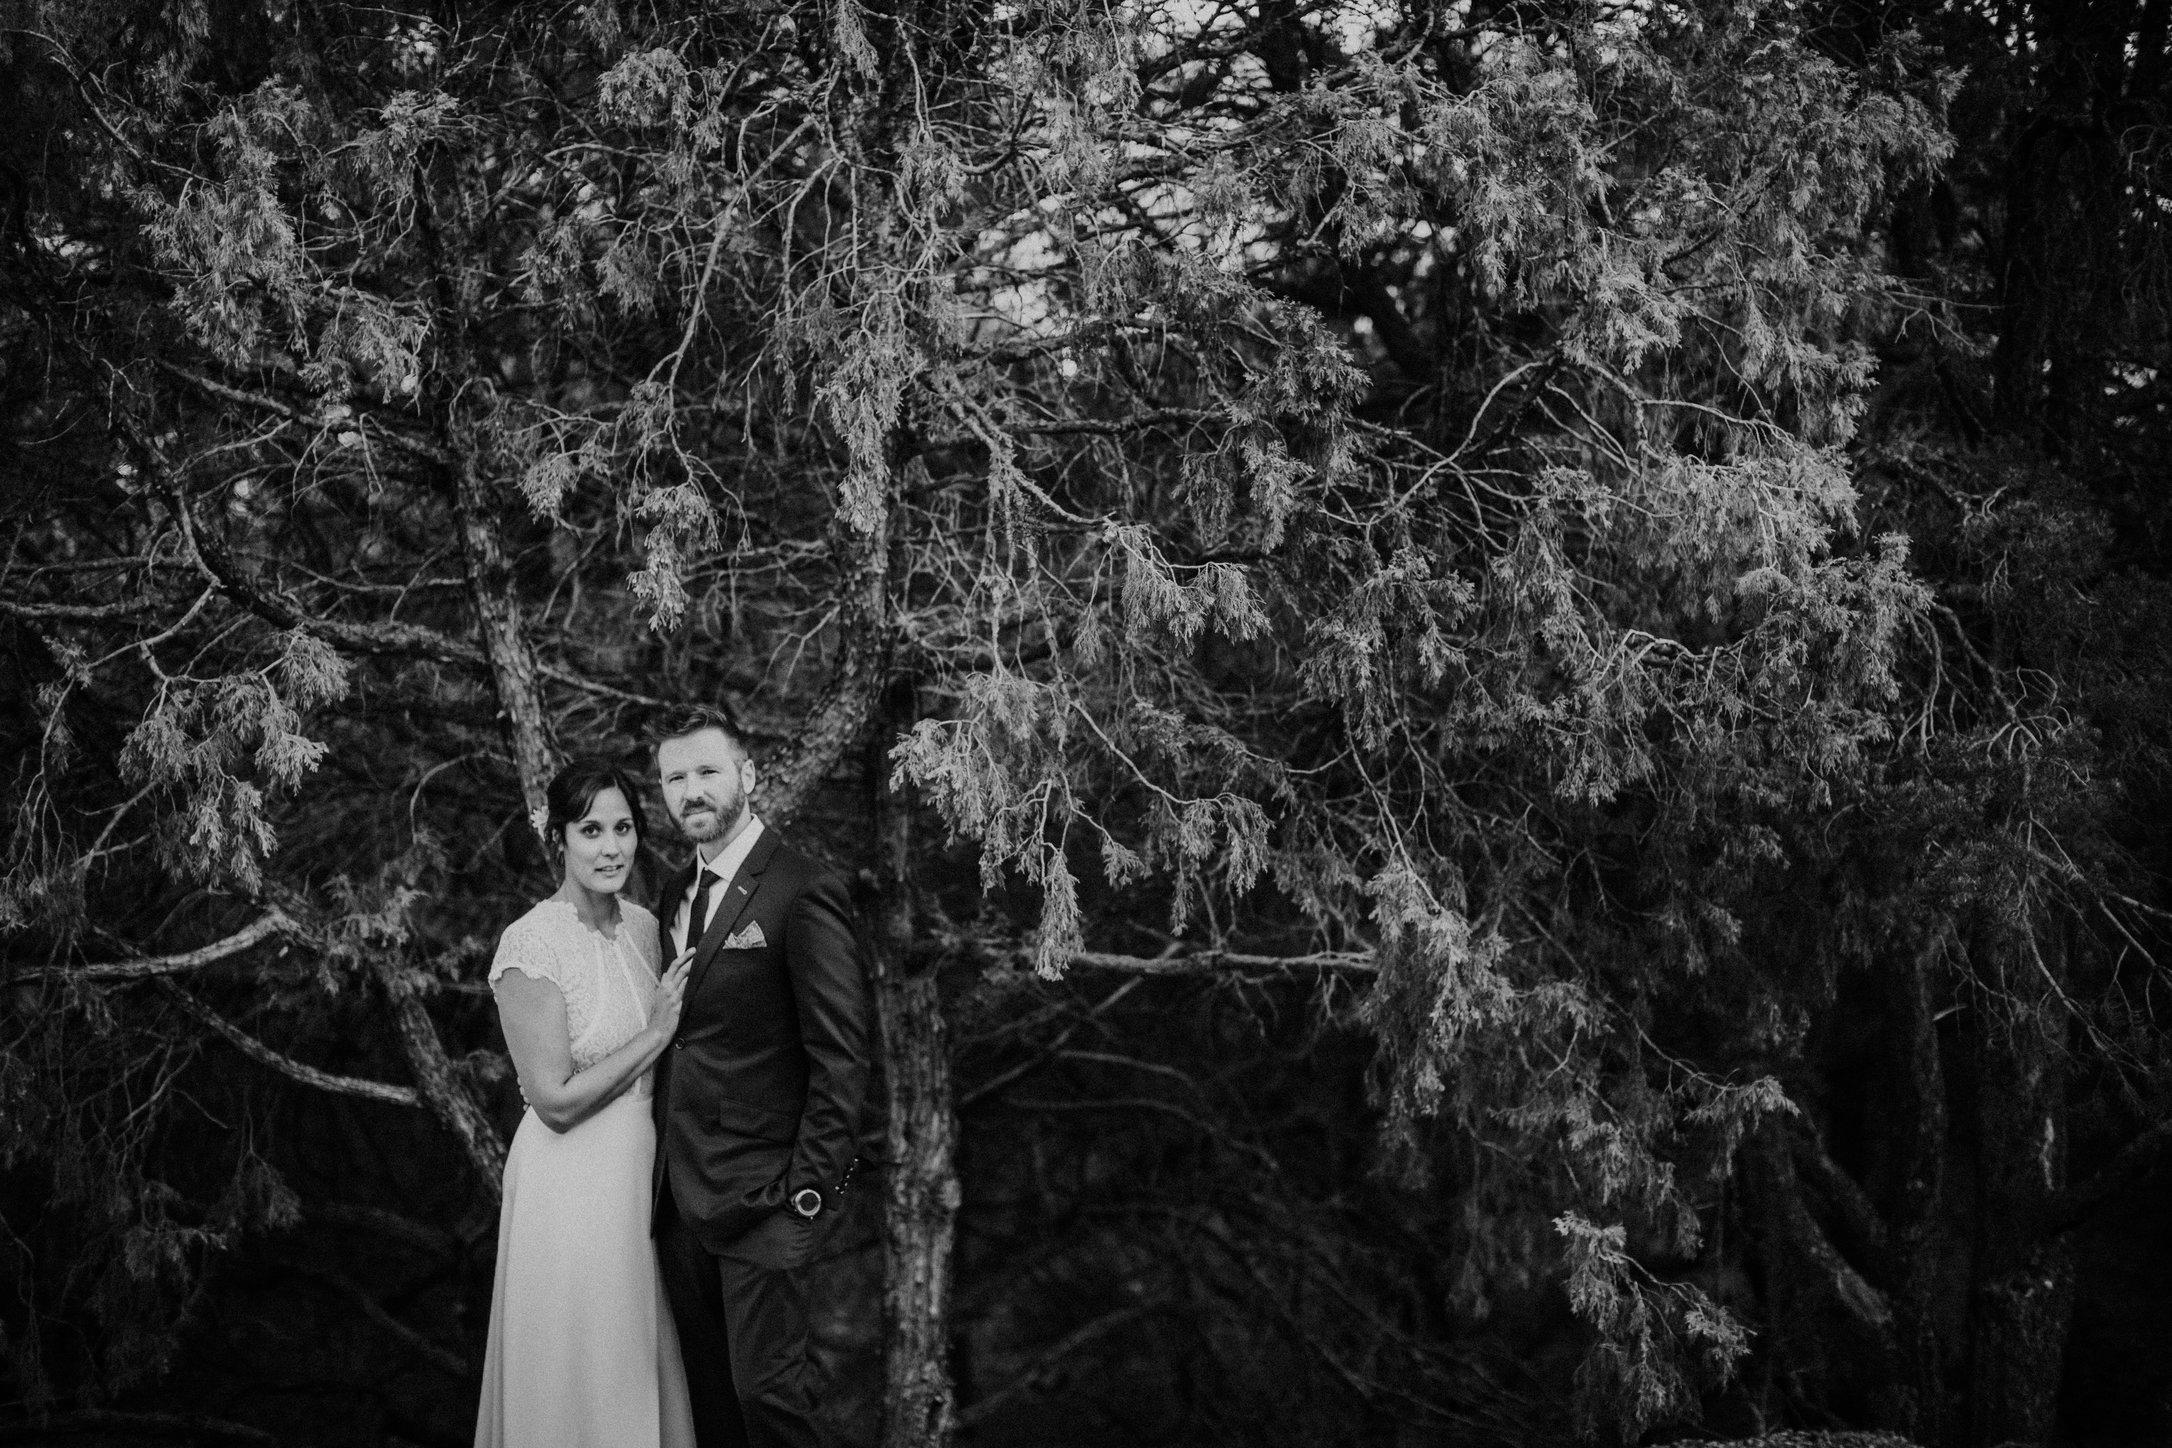 HandM-wedding-188.jpg